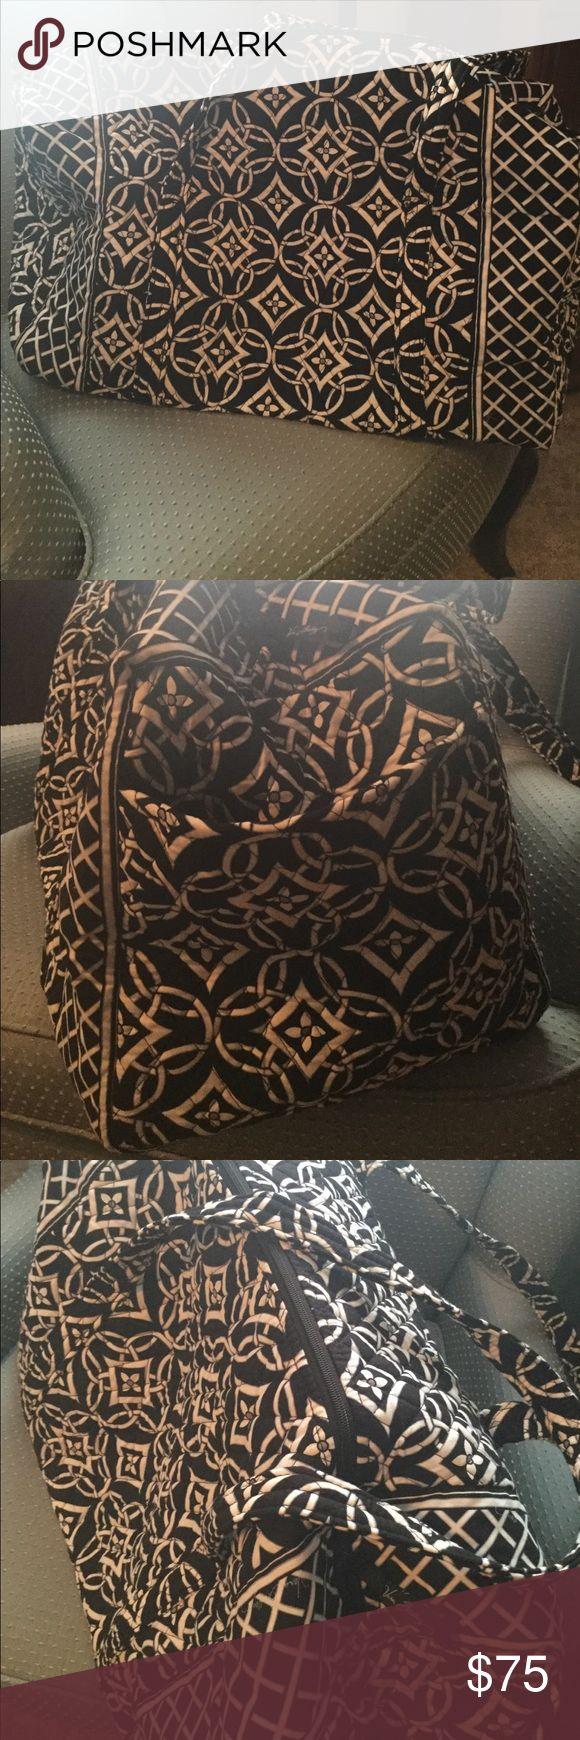 New Vera Bradley Large Duffel Bag Concerto Vera Bradley Bags Travel Bags